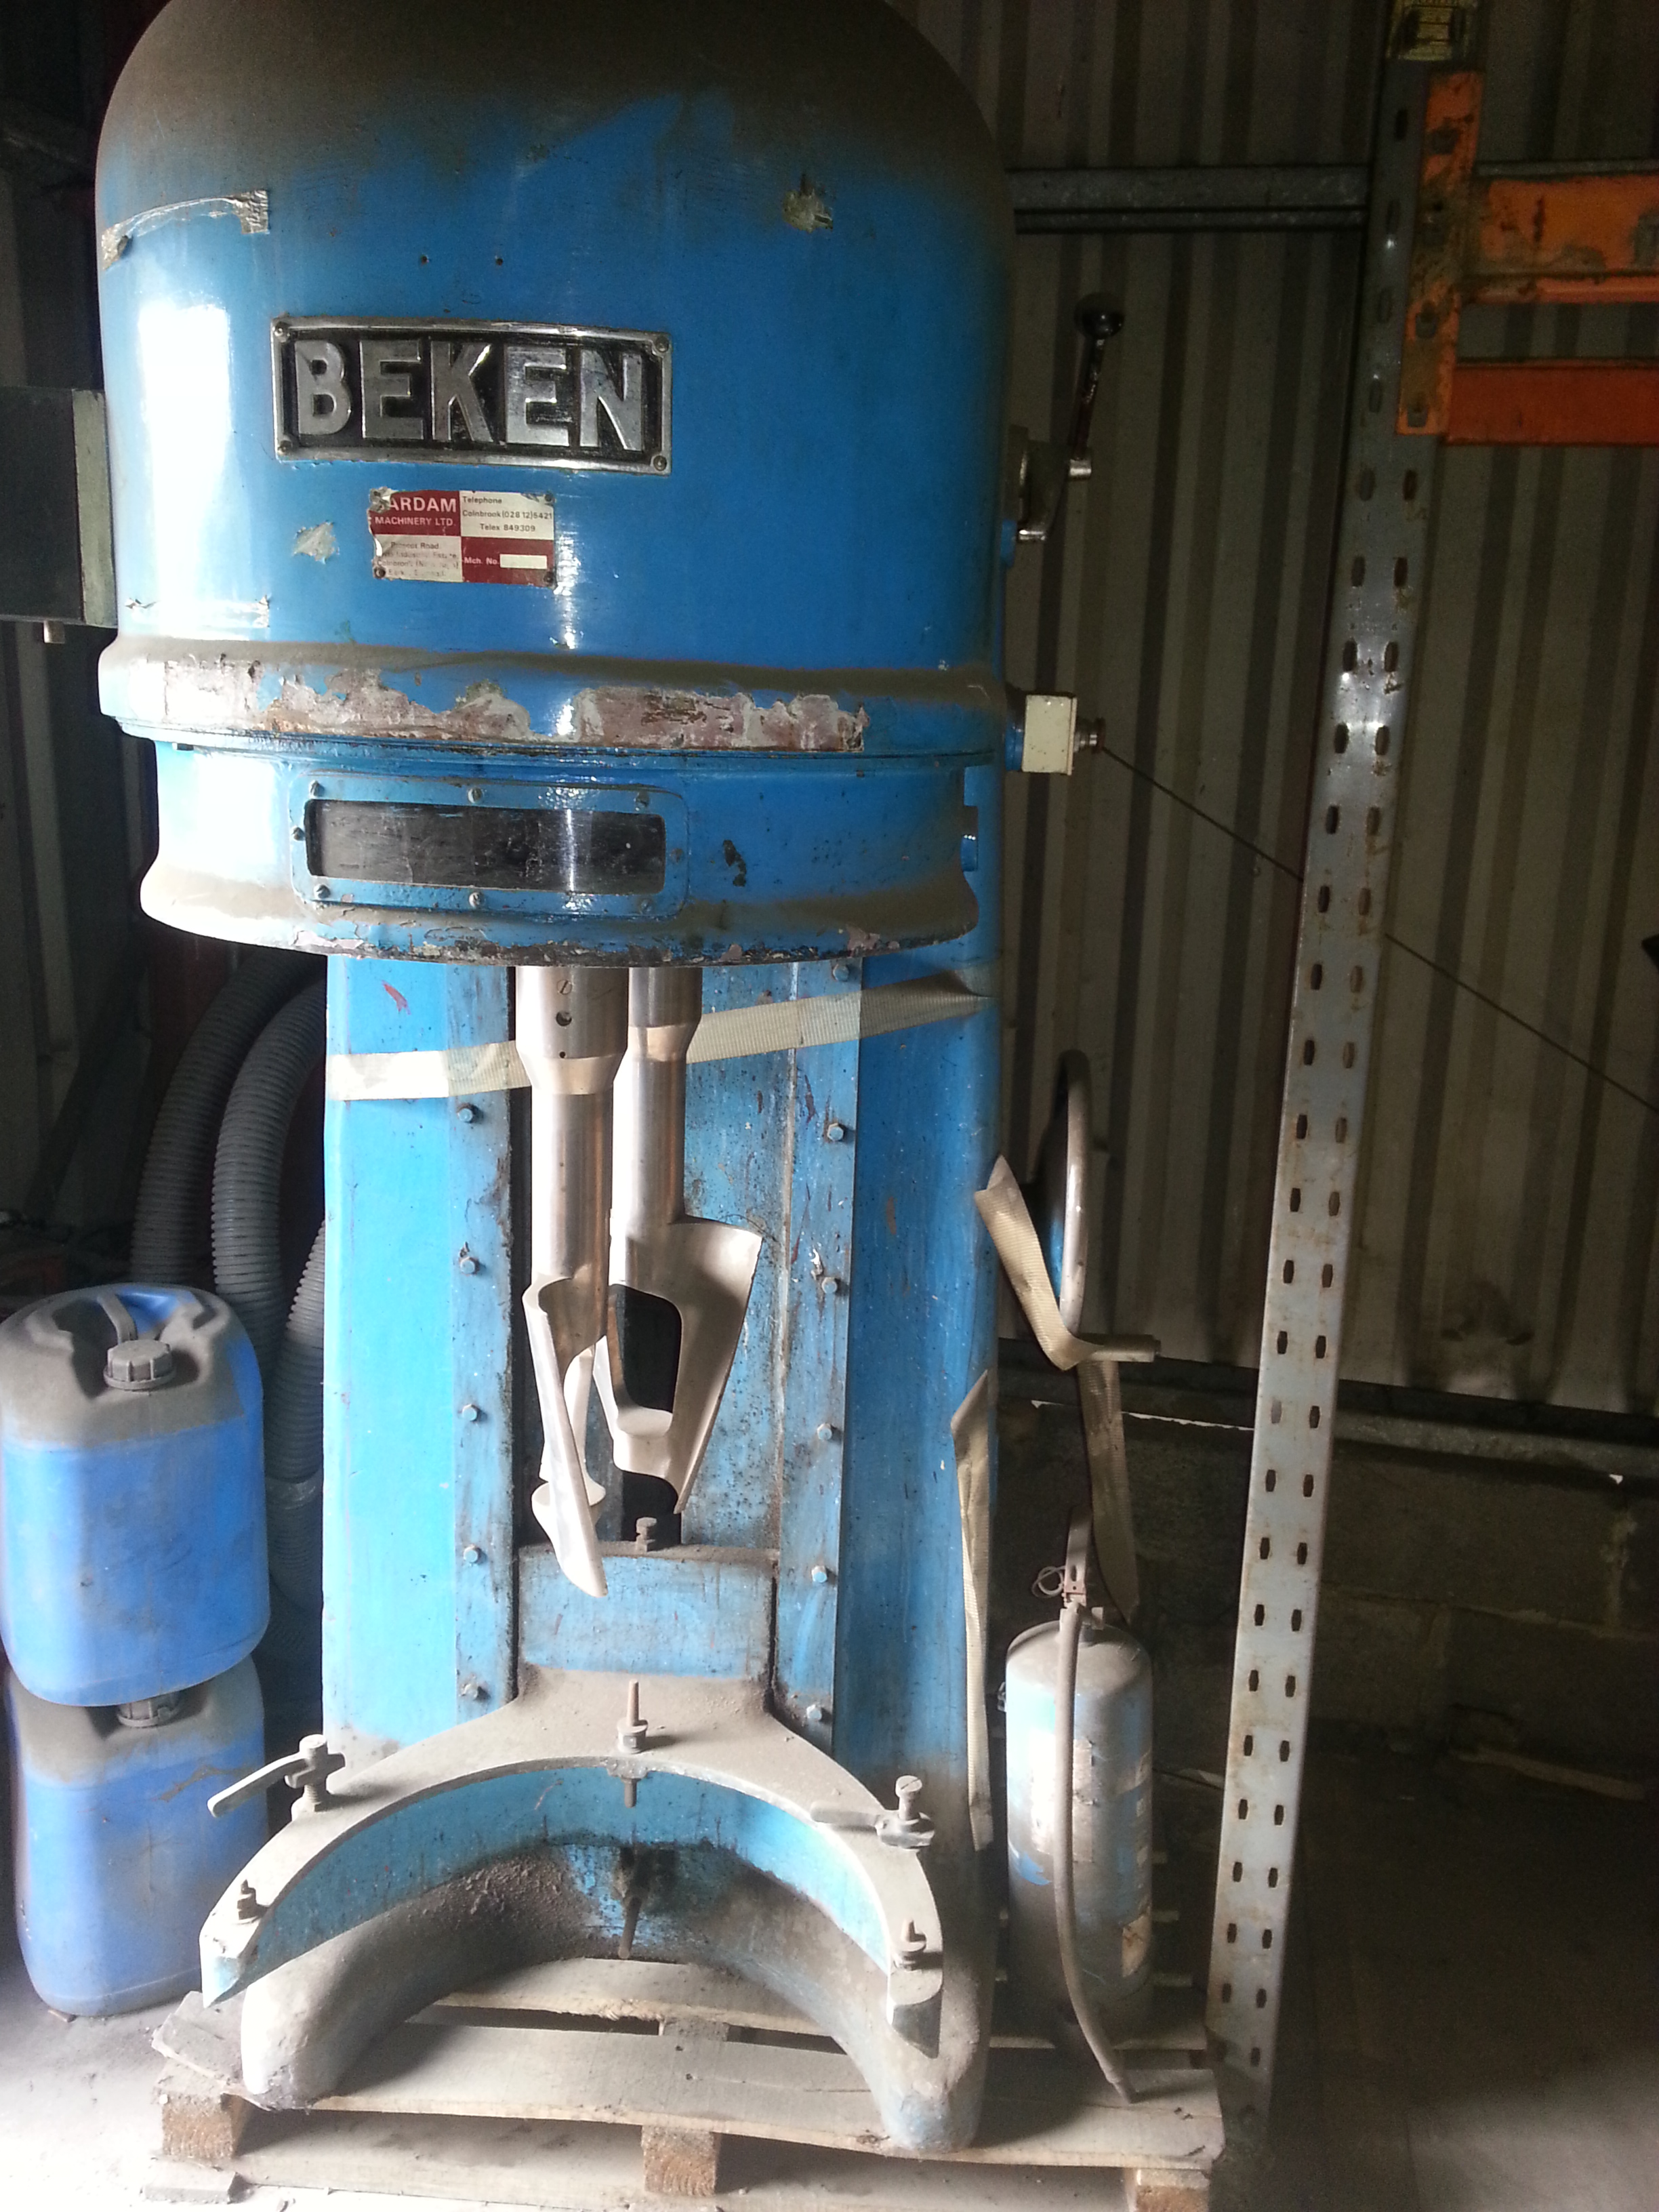 30 Gallon Beken Stainless Steel Planetary Mixer